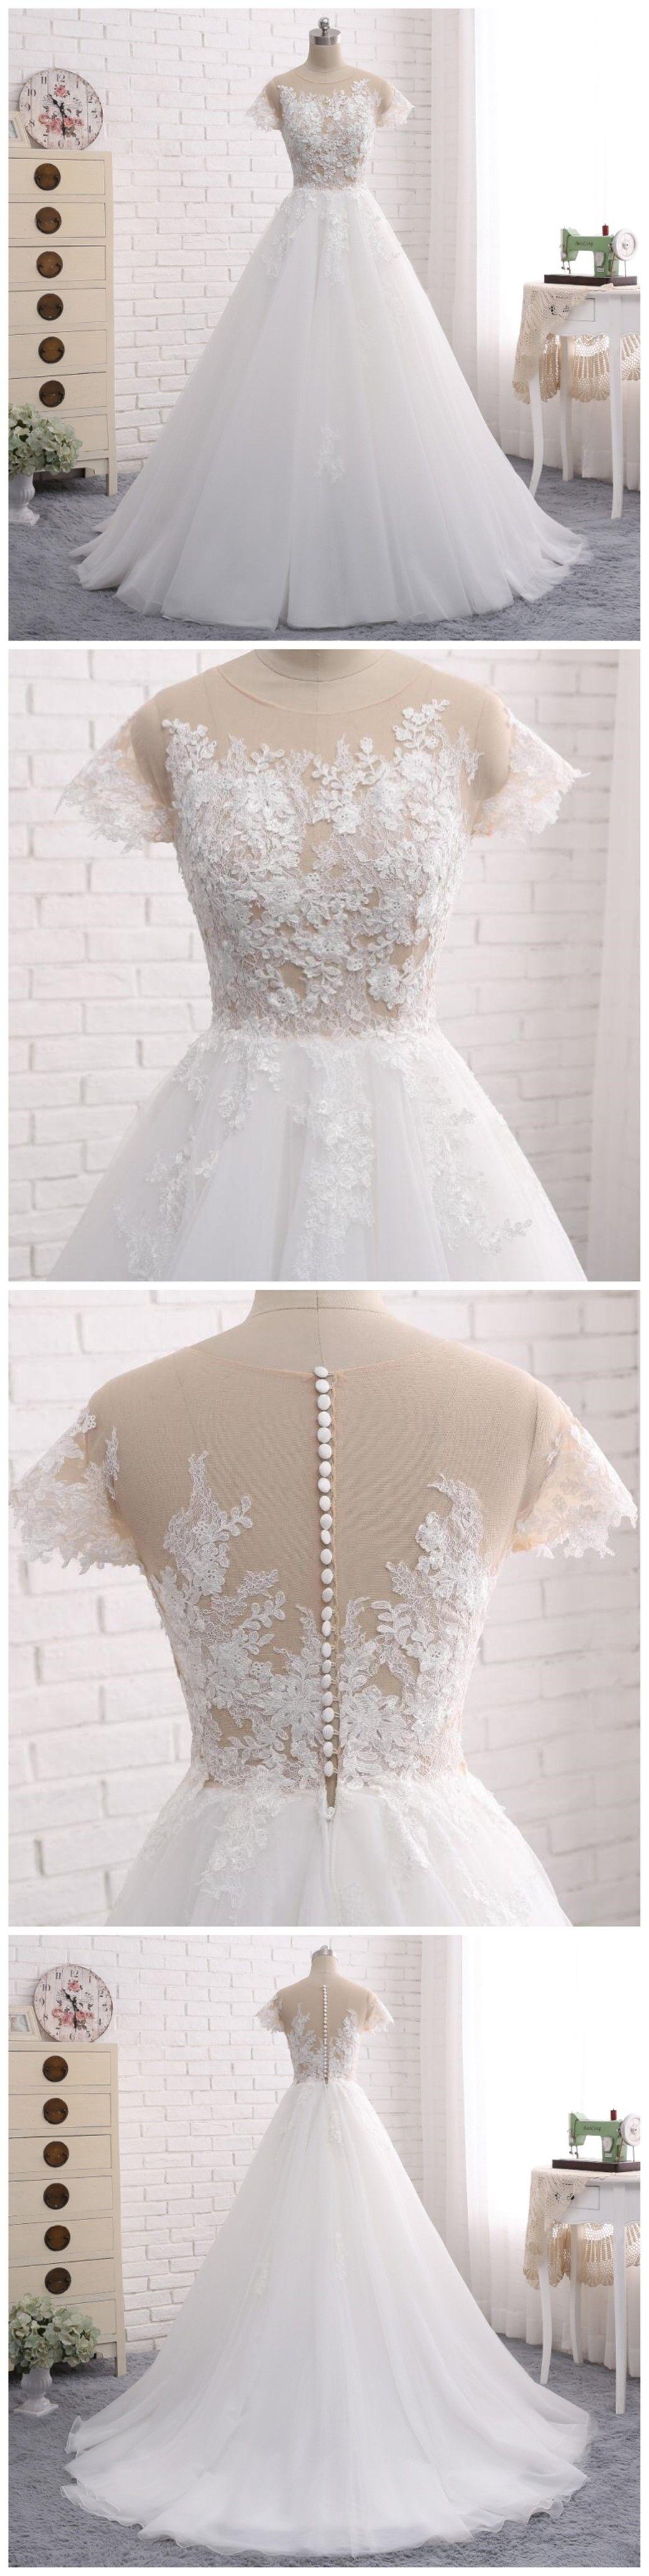 Custom made wedding dress  See Through Short Sleeve A Line Lace Wedding Bridal Dresses Custom